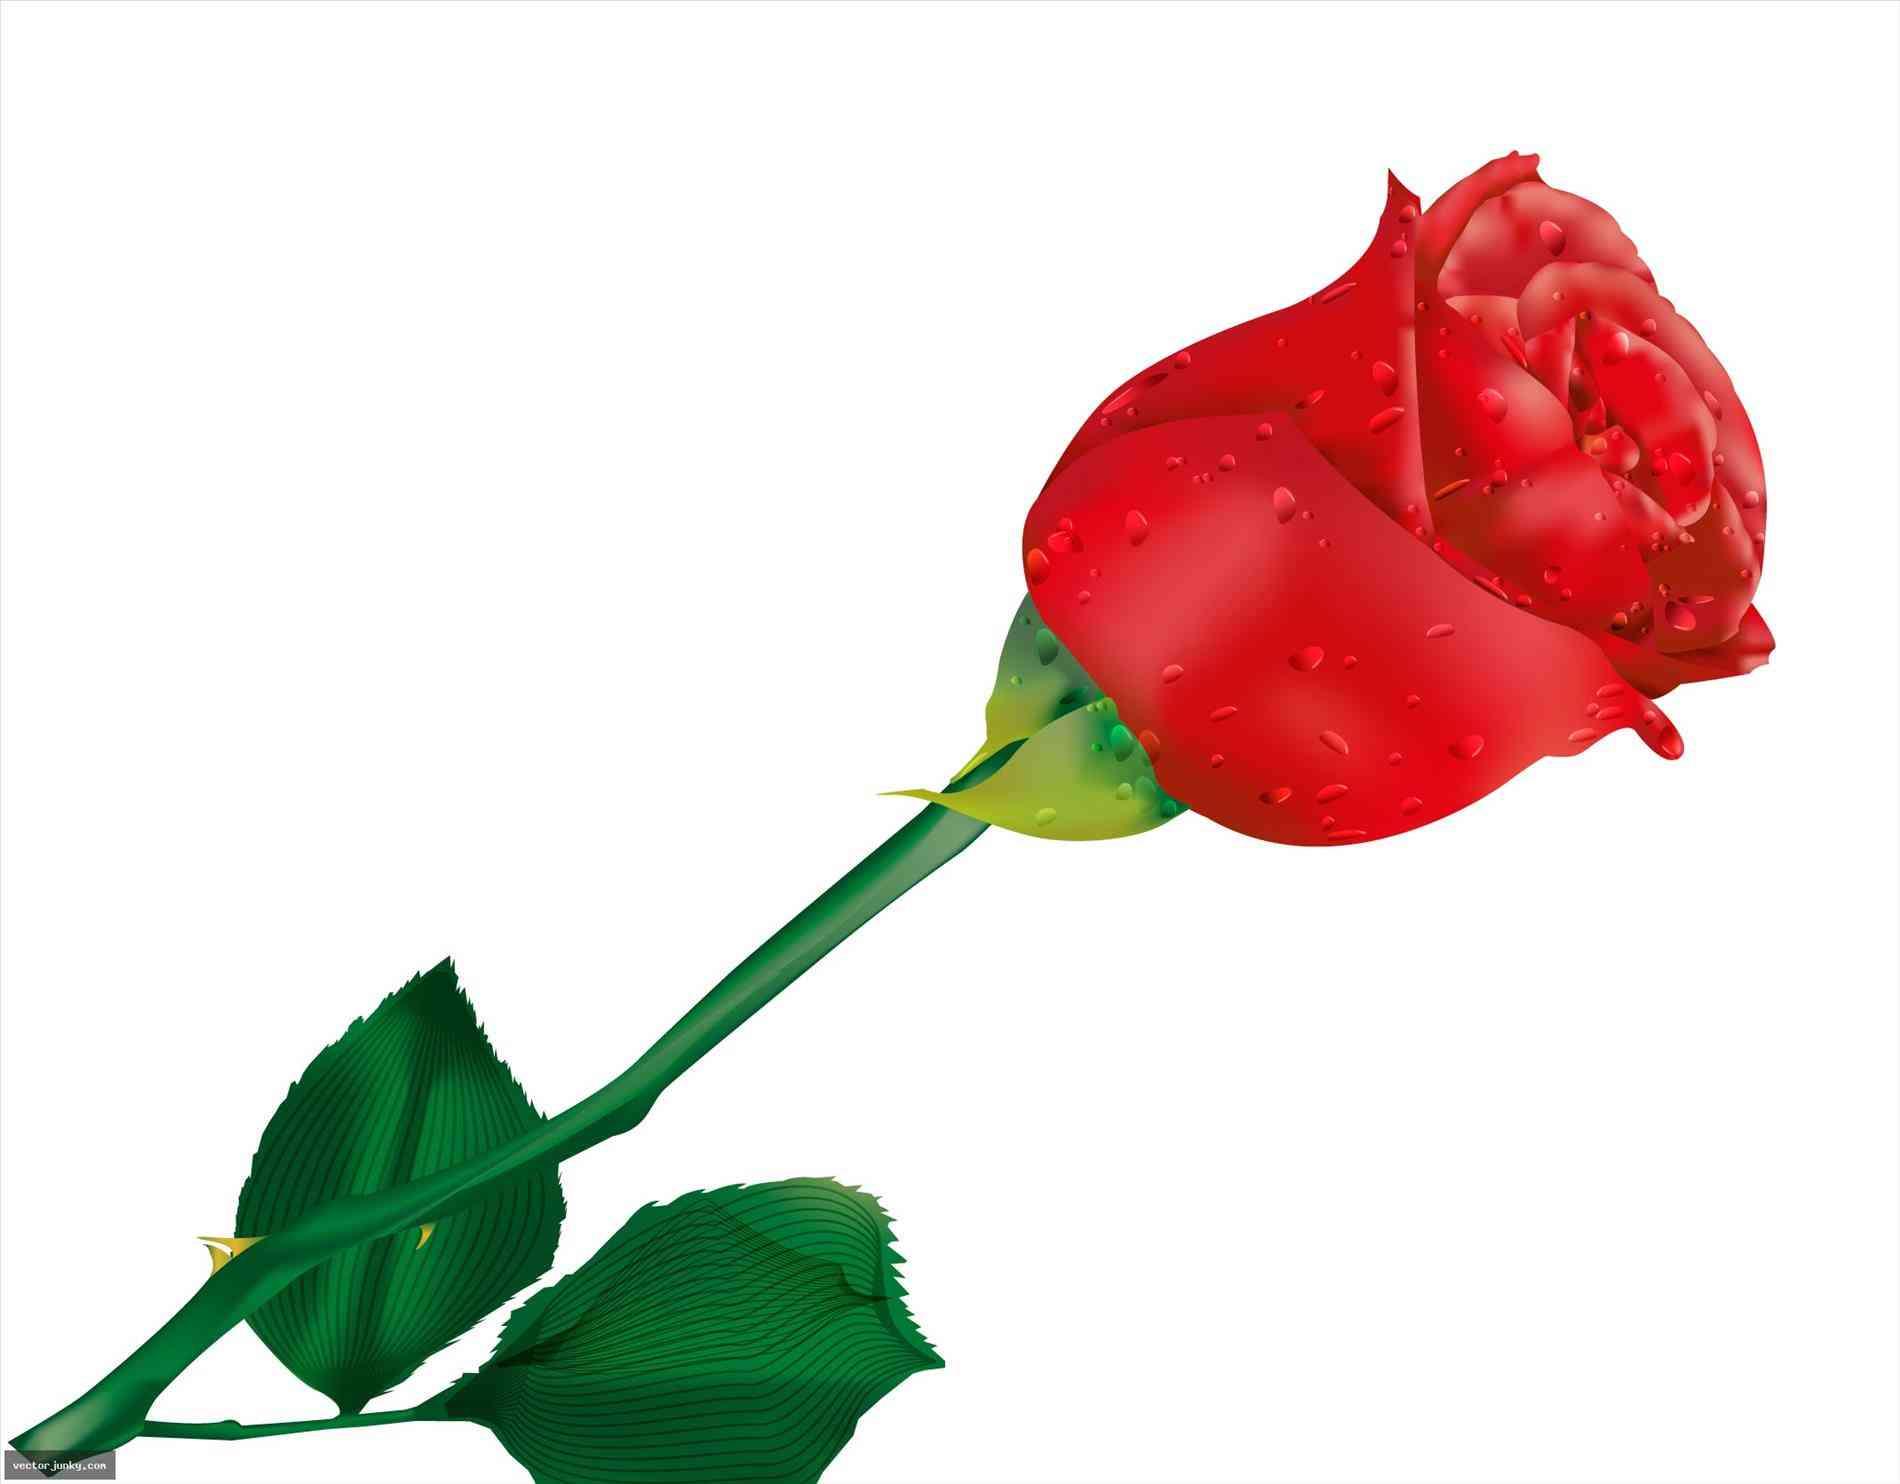 Rose Flower Clipart | Free download best Rose Flower Clipart on ... for Vector Rose Flower Png  303mzq